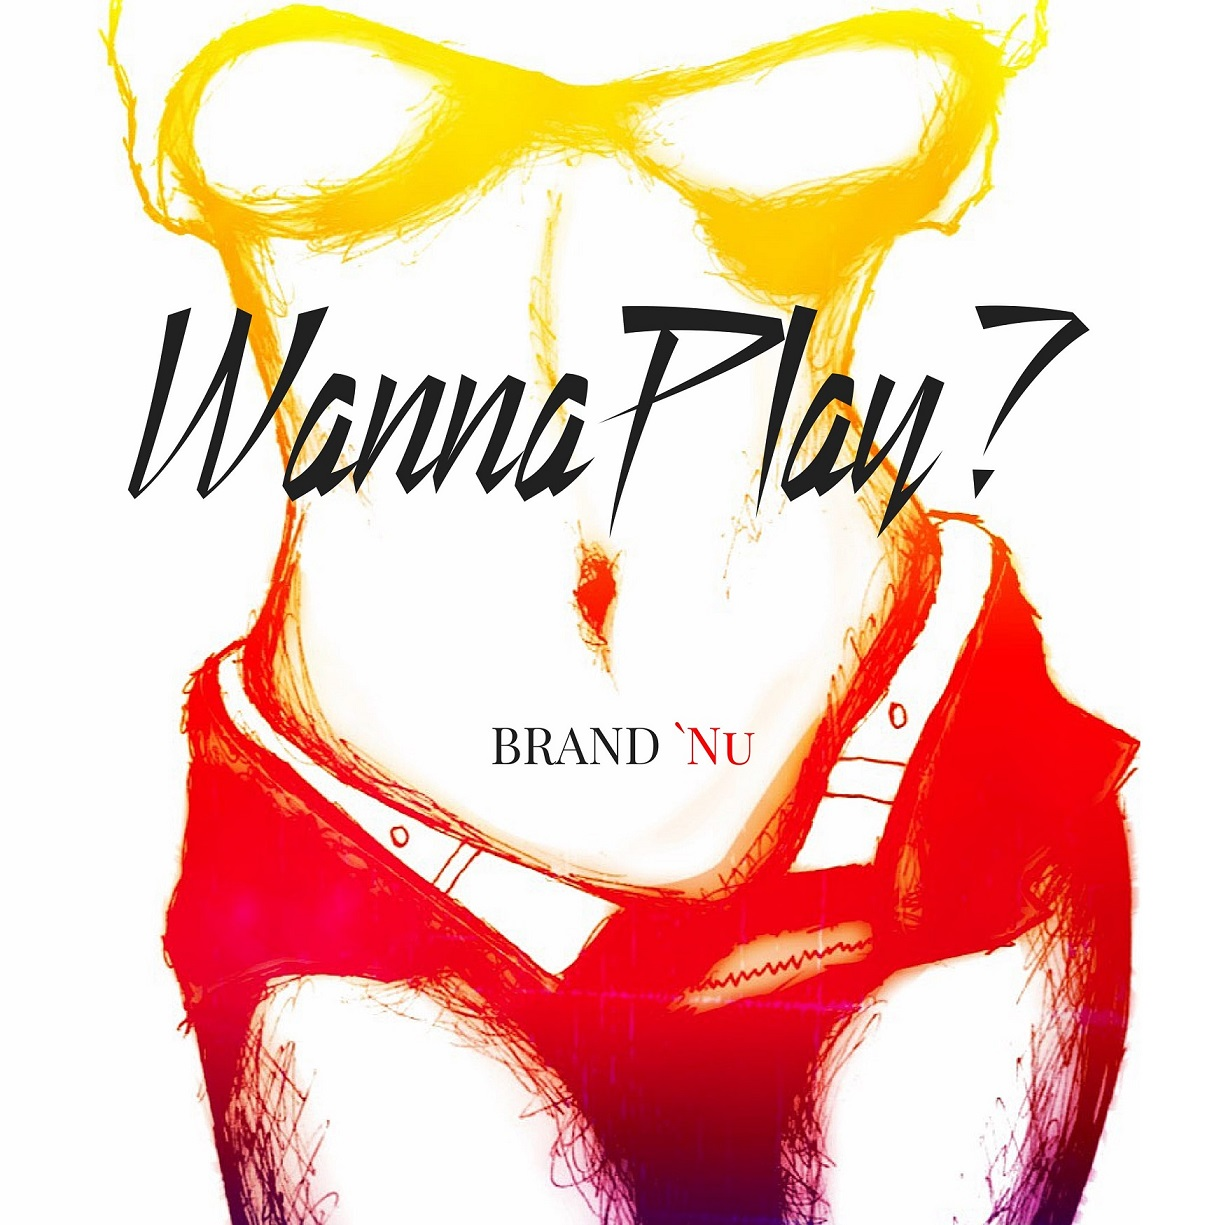 New Music: Brand Nu – Wanna Play? | @Brandnu4real